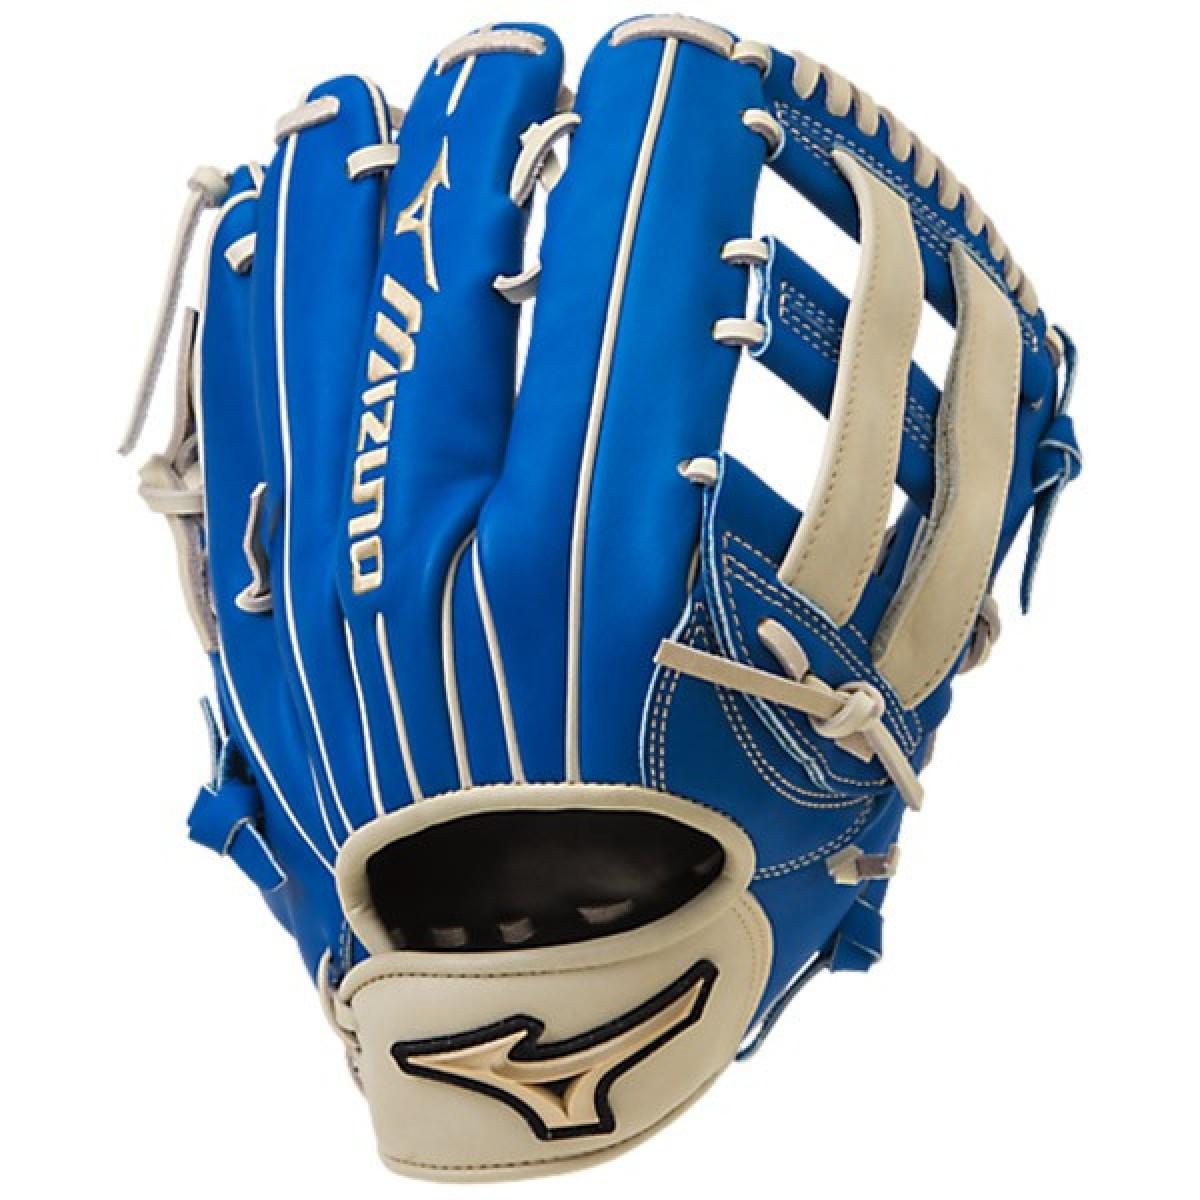 mizuno baseball gloves mizuno gge73 global elite 12.75 inch pro baseball glove SPJELWS